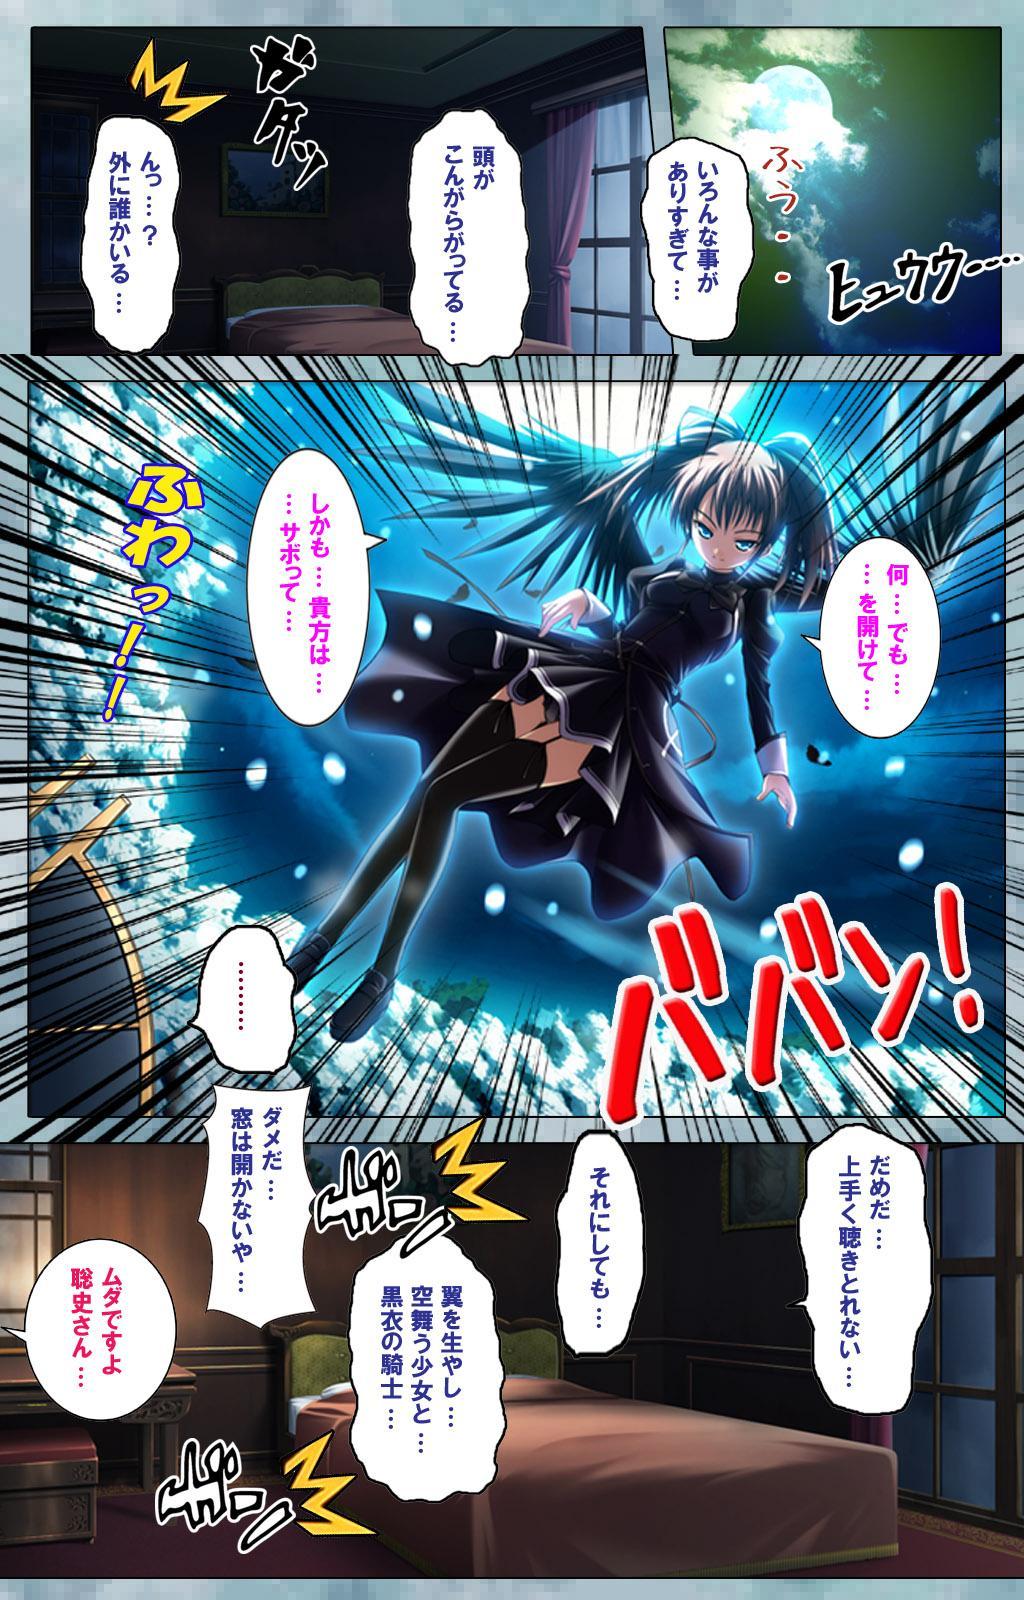 [Applemint] [Full Color seijin ban] Bijin shimai no yuwaku ~ himegoto ni oboreru otoko ~ Complete ban 54